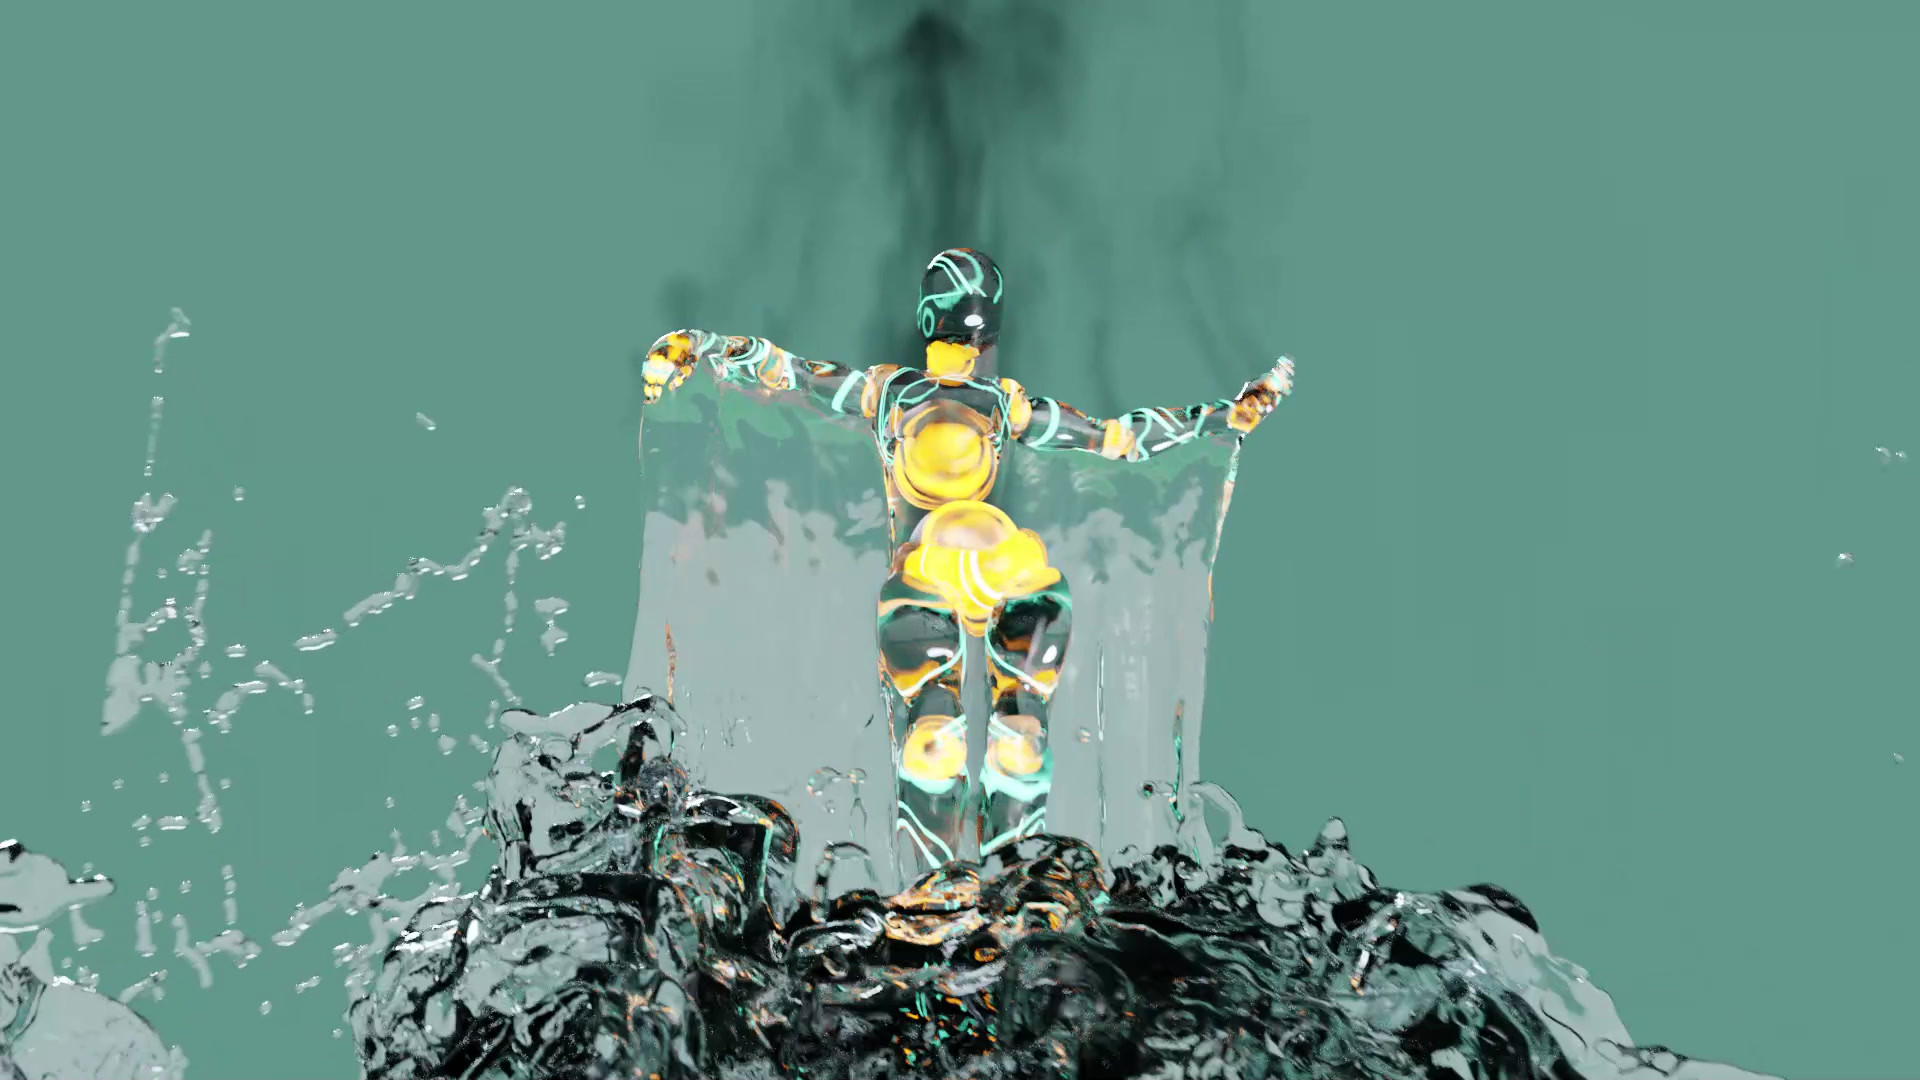 Dancing Fluid Simulation